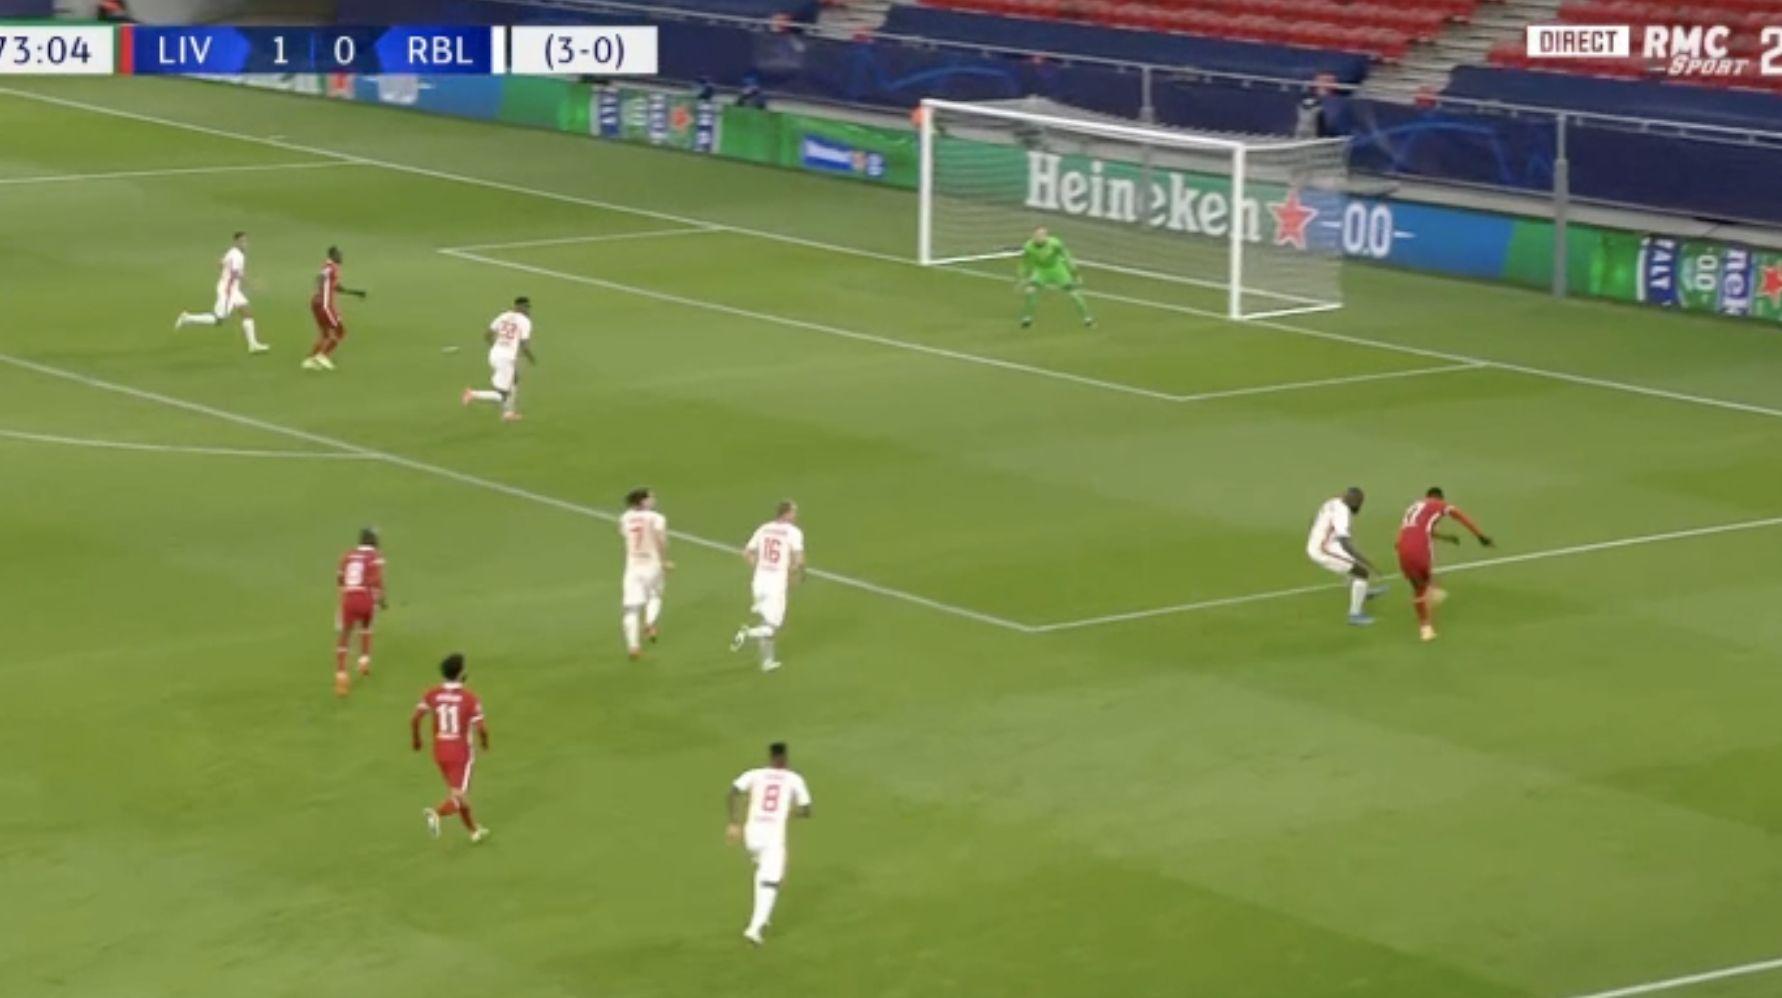 (Video) Powerhouse Origi delivers super assist for Sadio Mane goal v Rb Leipzig